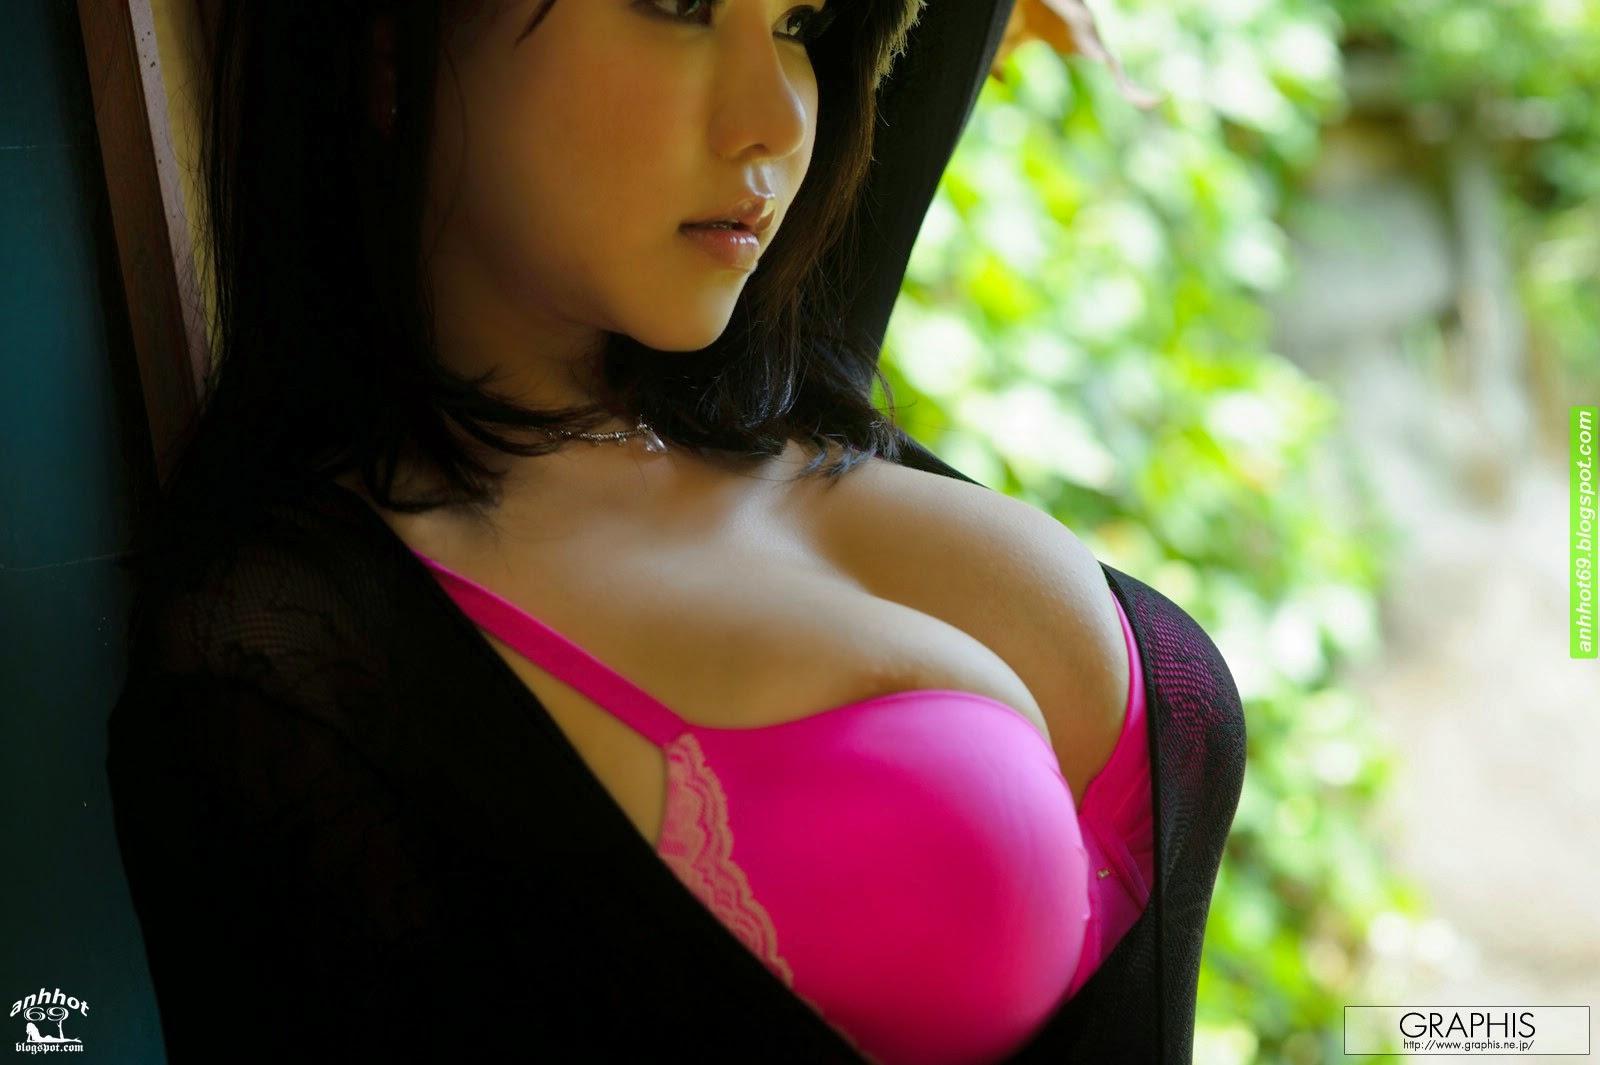 anri-okita-02298687